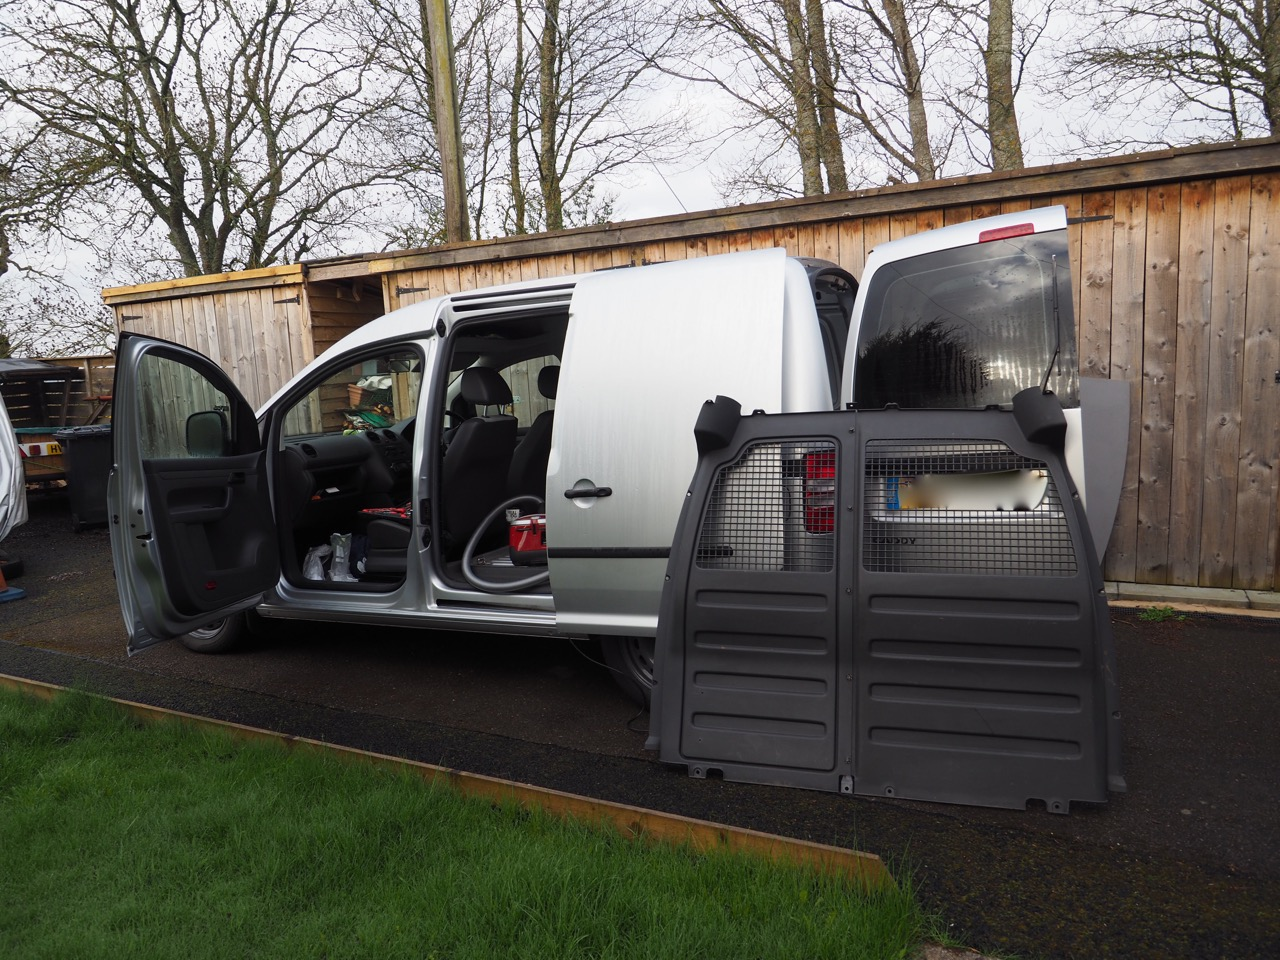 57 Degrees North: VW caddy van conversion